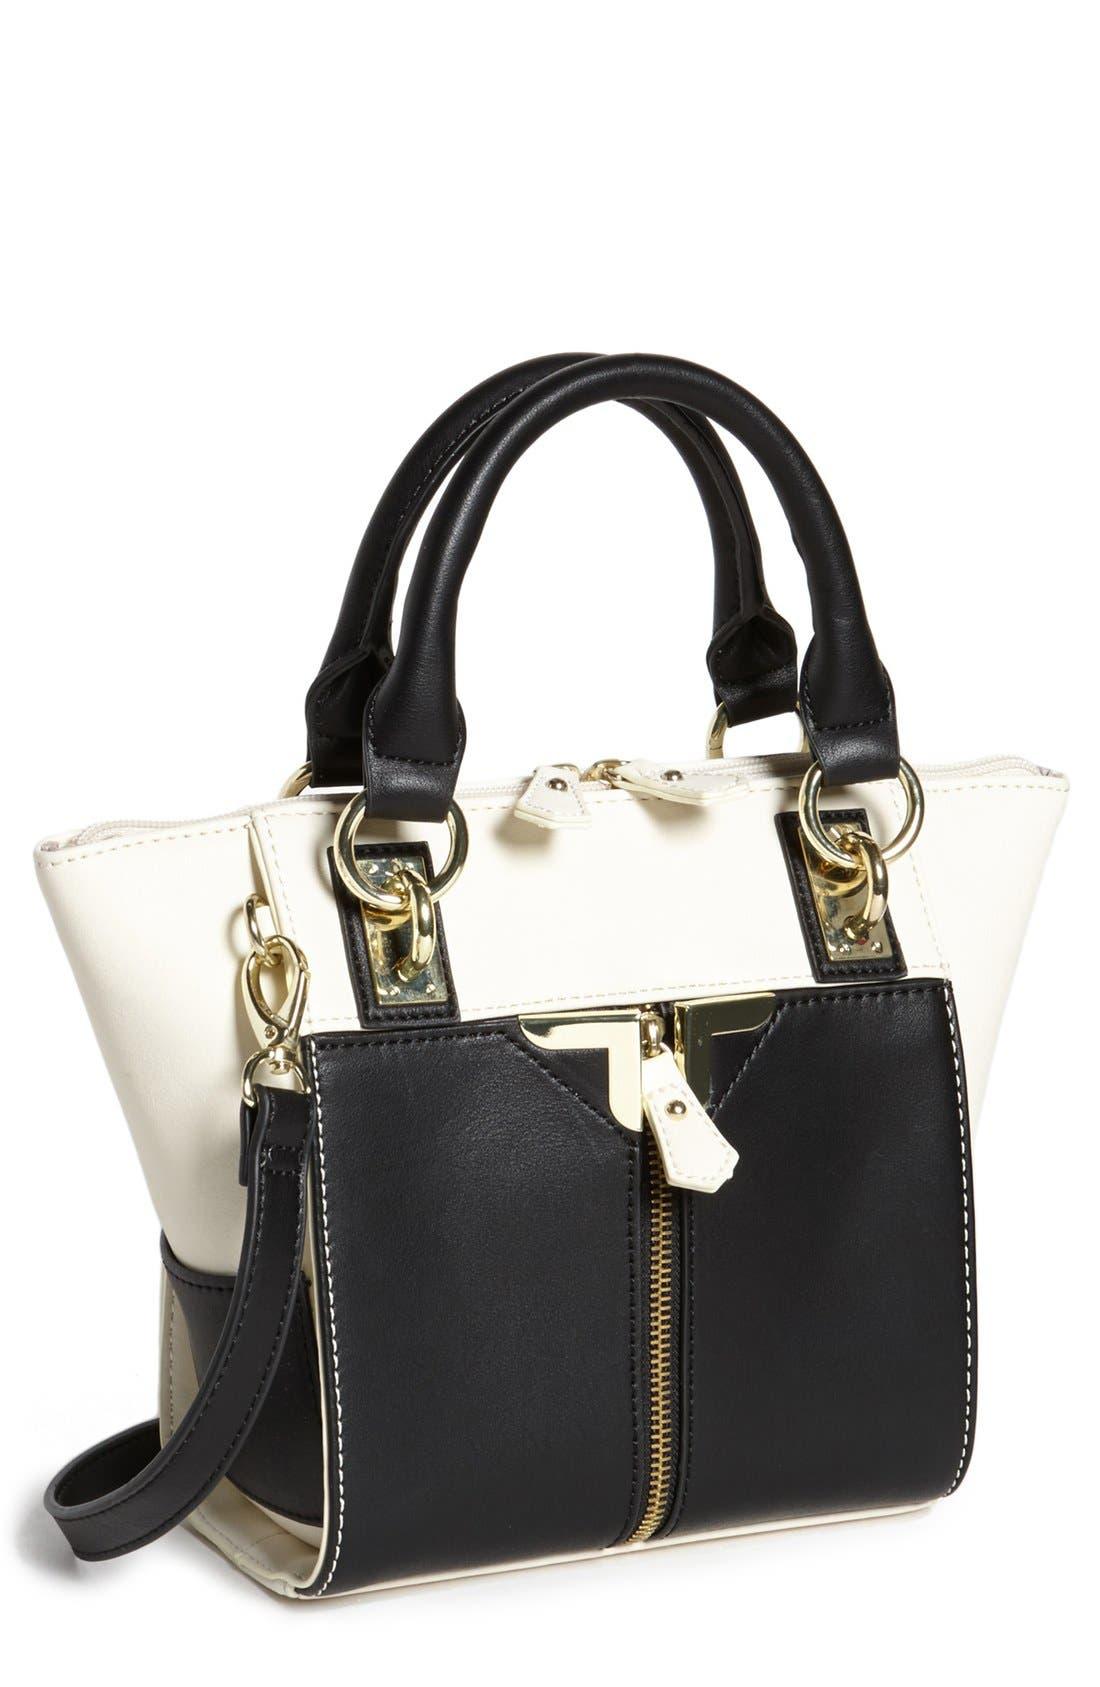 Alternate Image 1 Selected - Danielle Nicole 'Alexa - Mini' Crossbody Bag